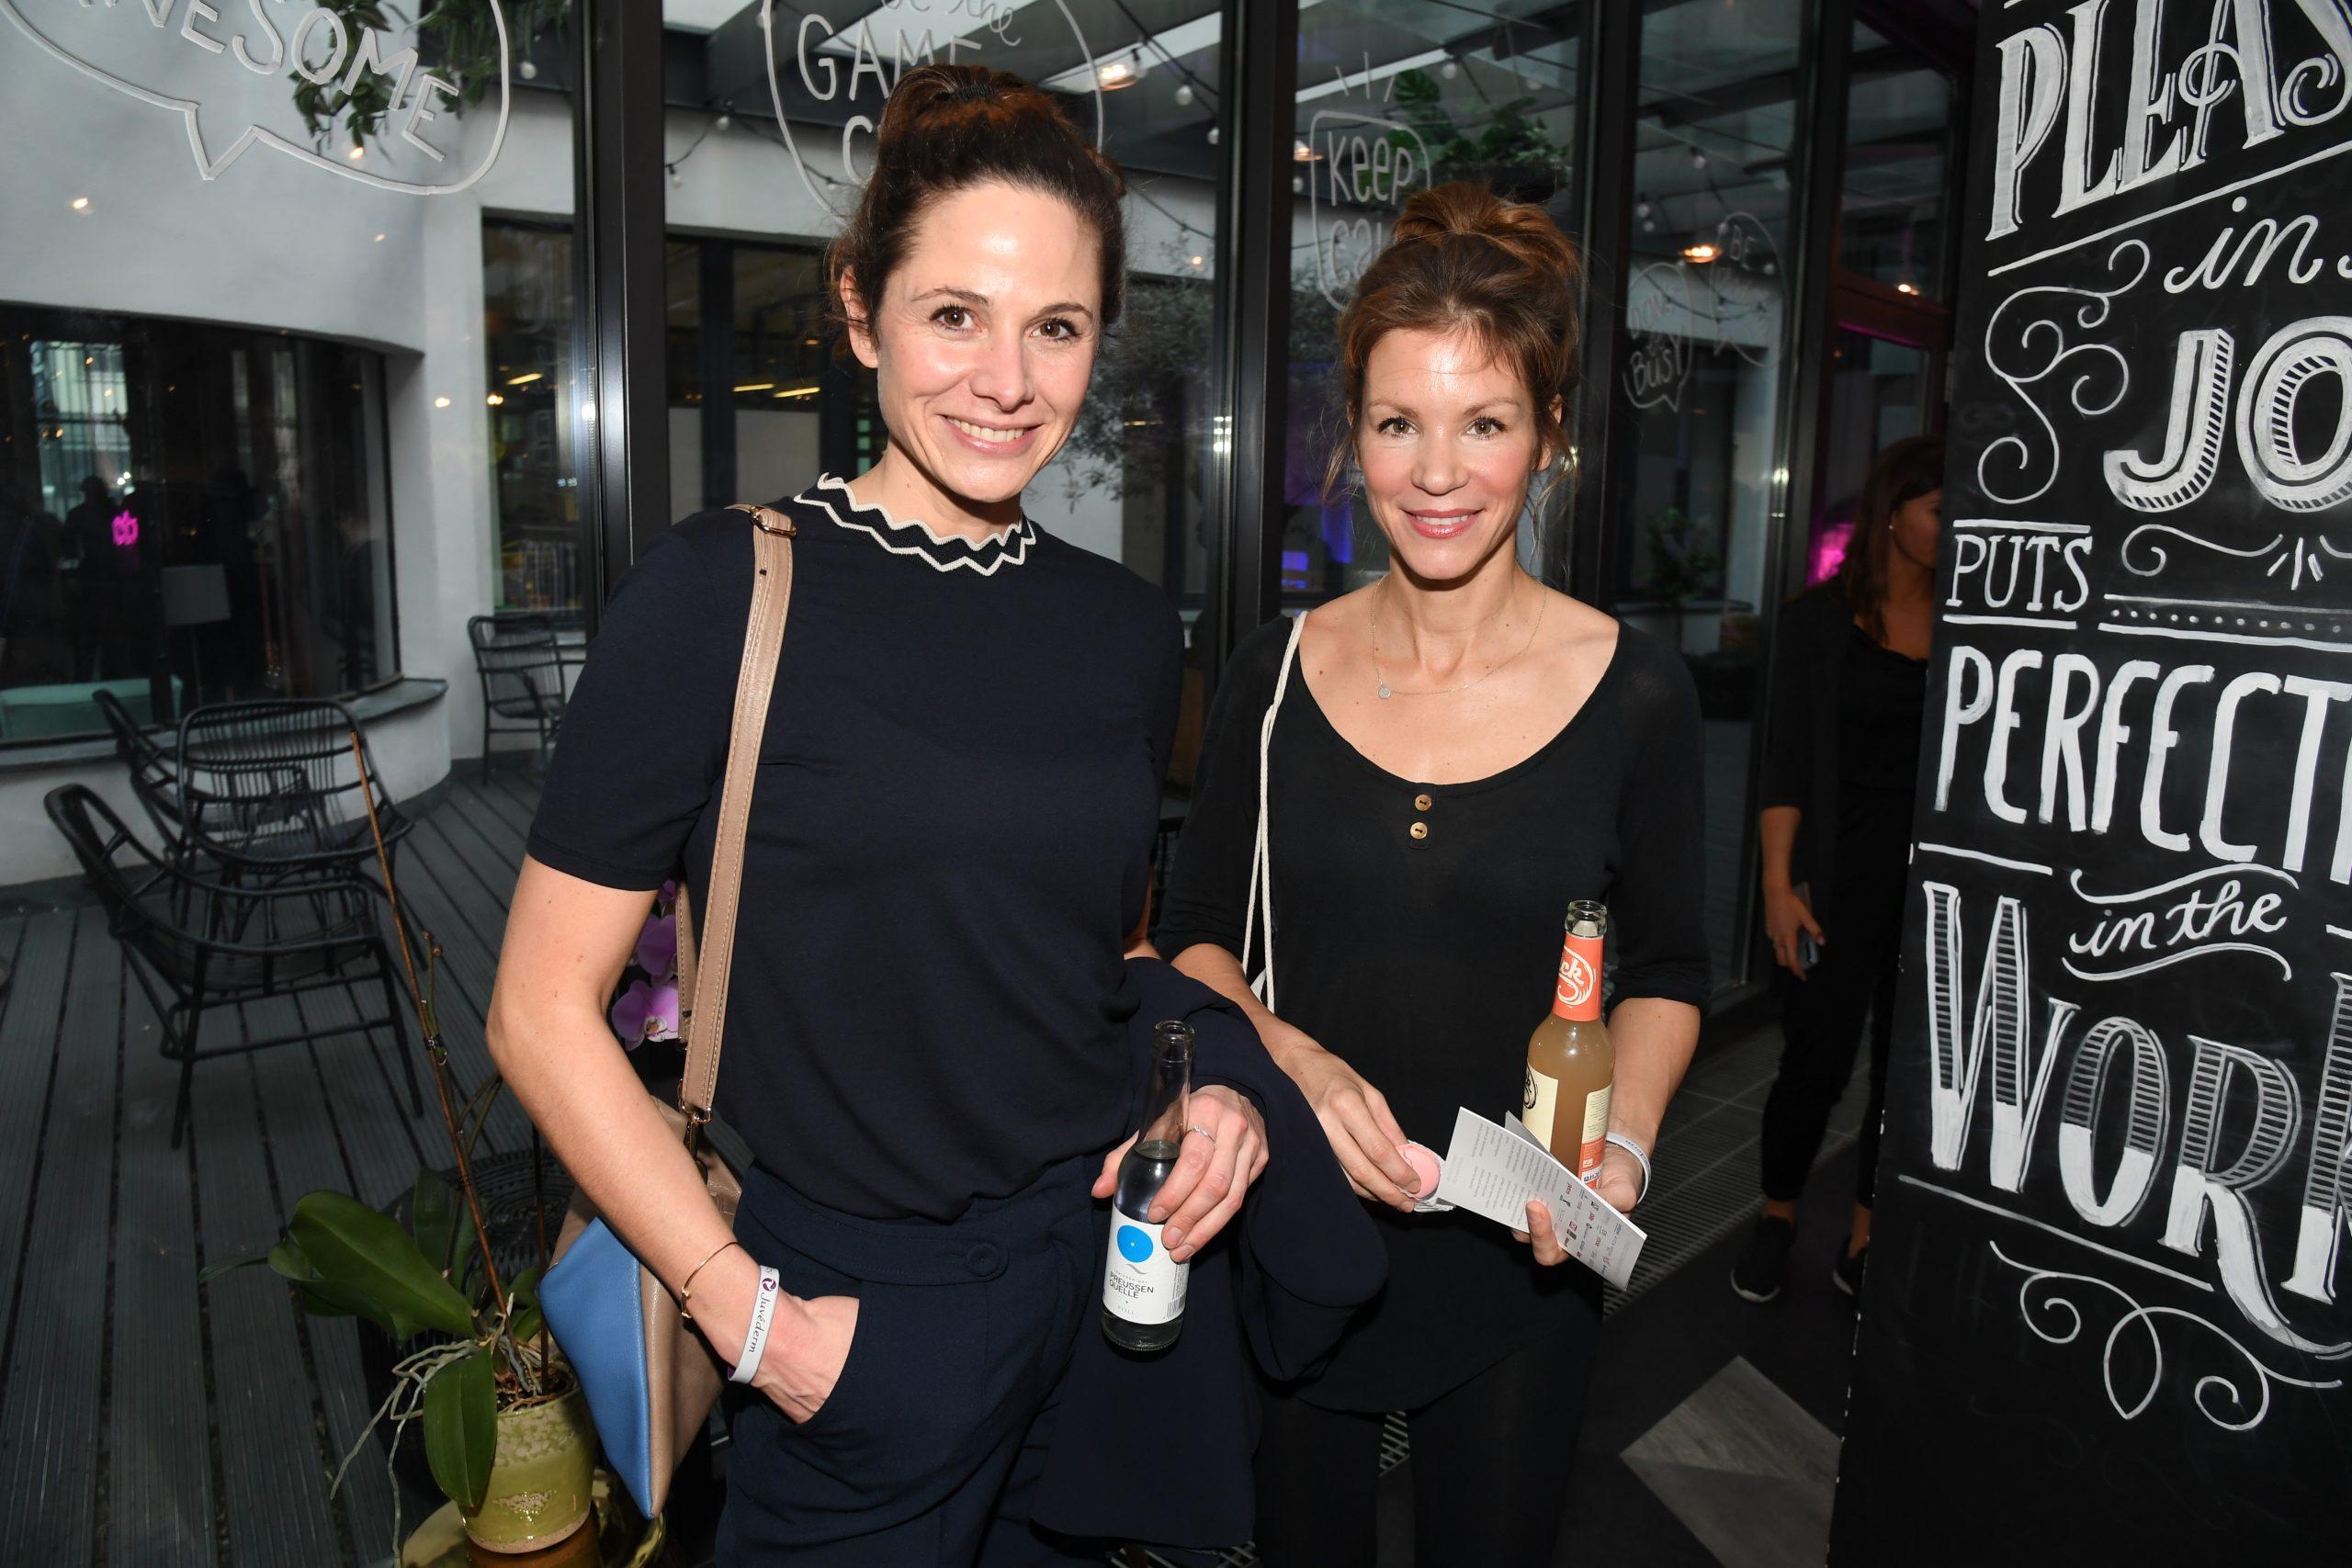 Ellenie Salvo Gonzales, Nina Gnädig @Beauty2Go-Lounge ©Starpress Kay Kirchwitz